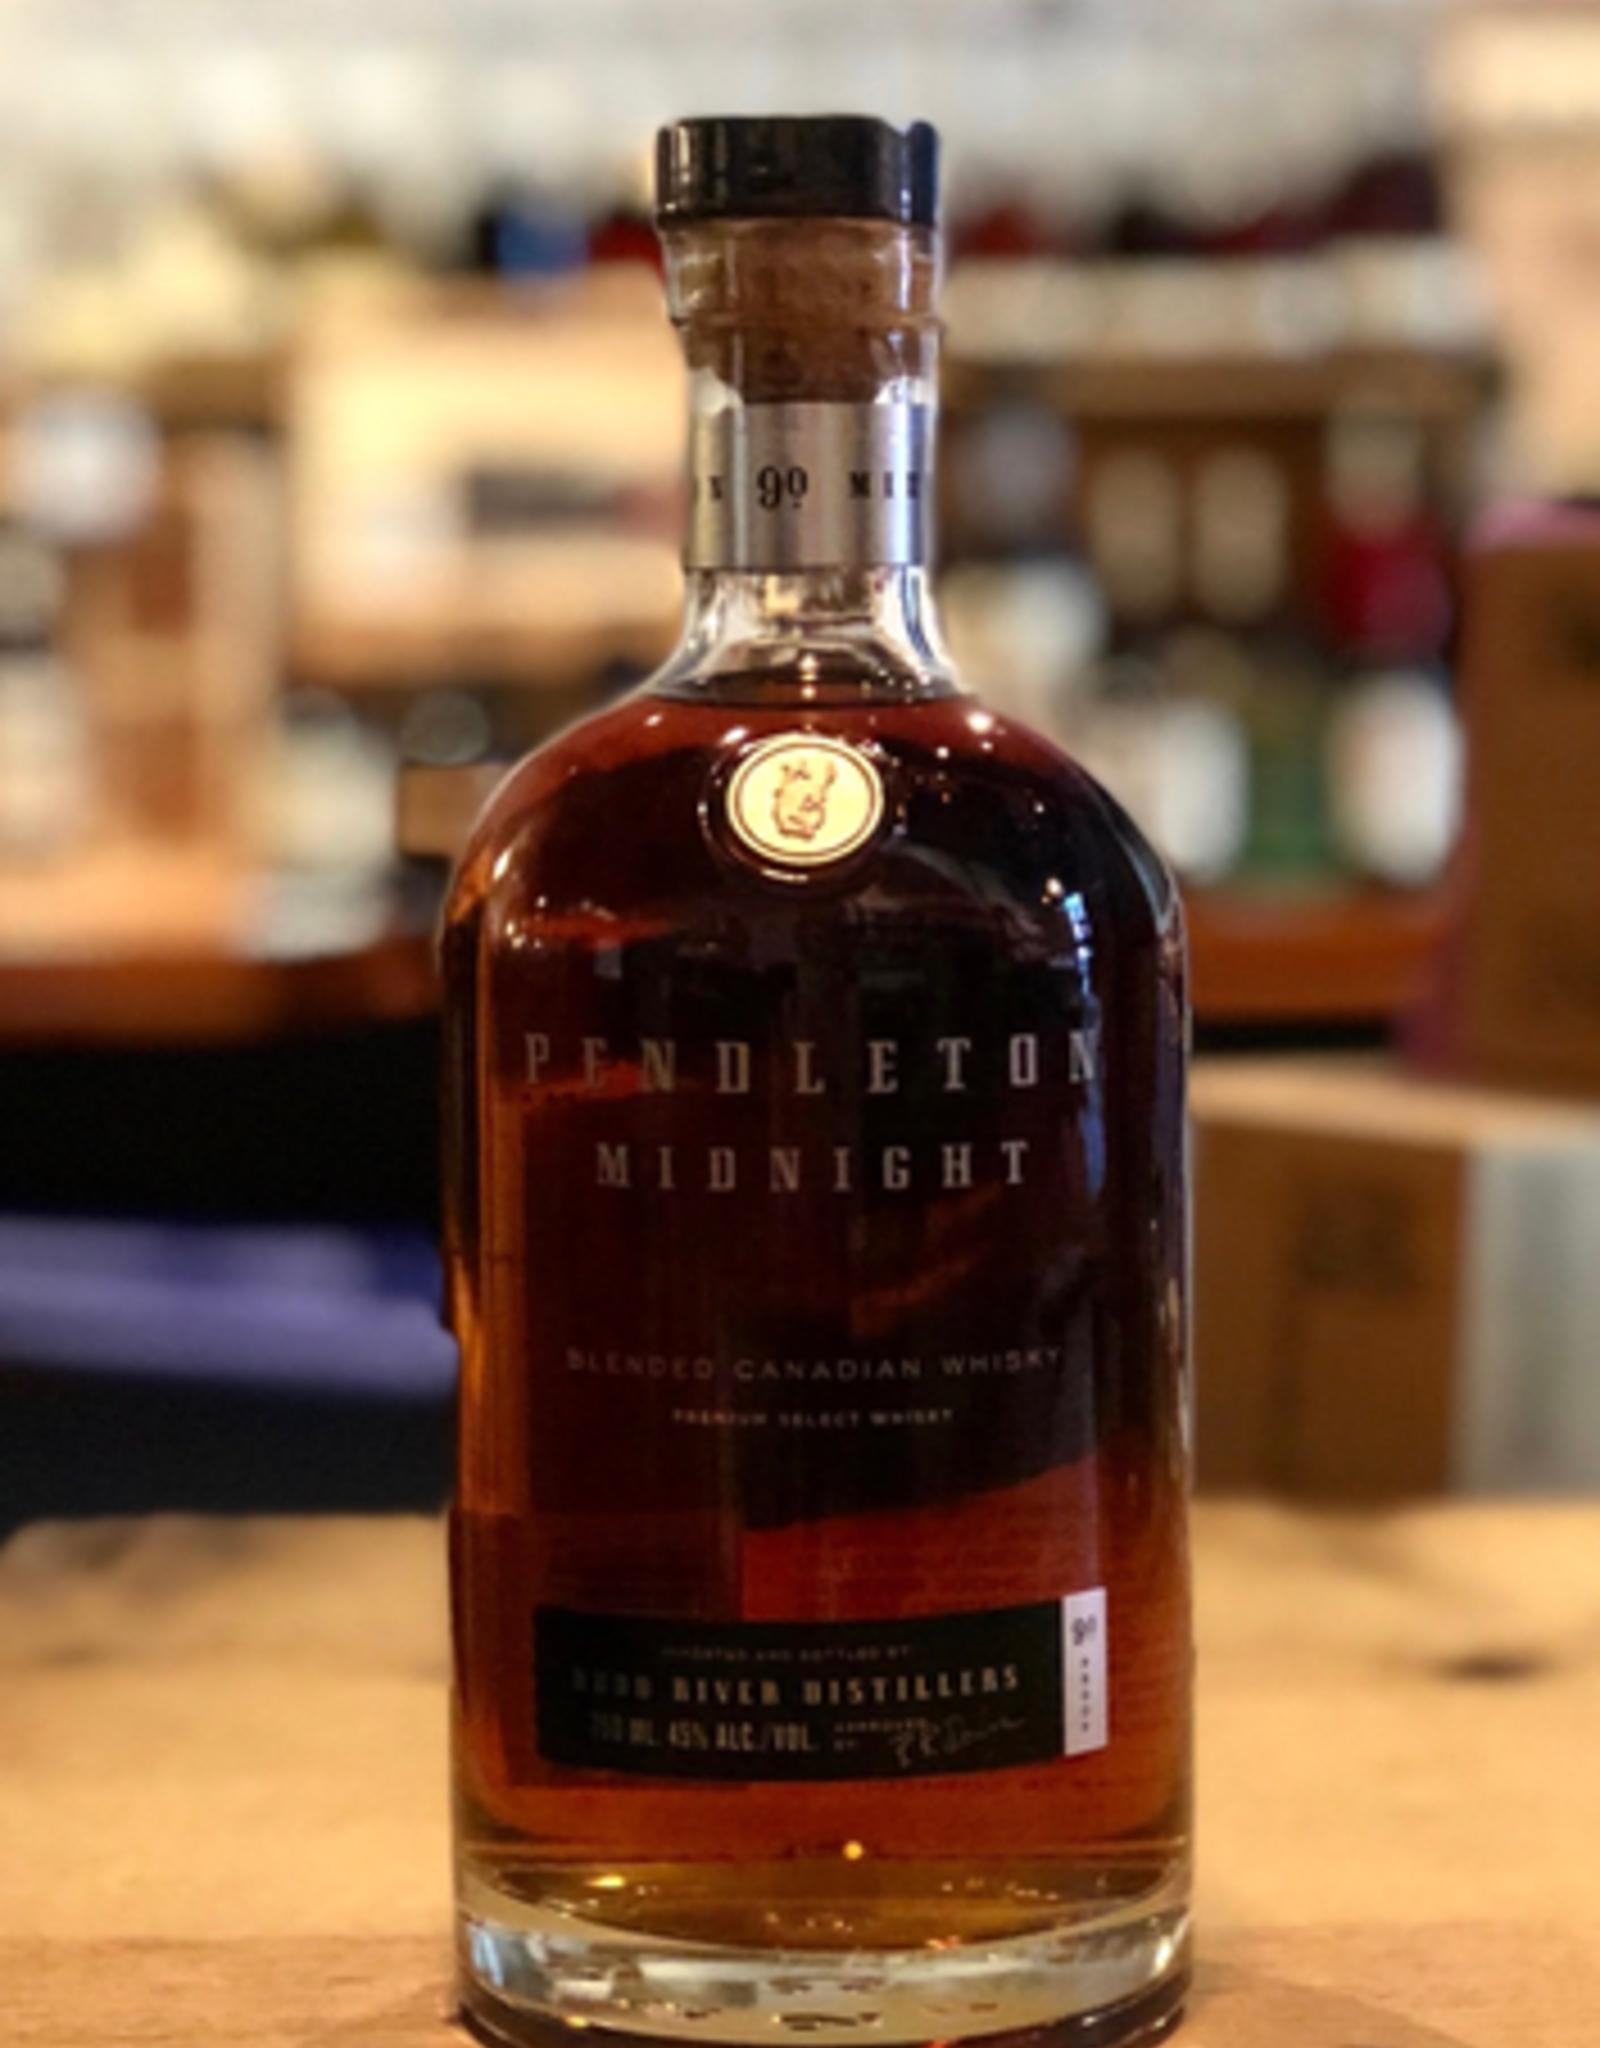 Pendleton Midnight Whisky, Hood River Distillers - Canada (750ml)